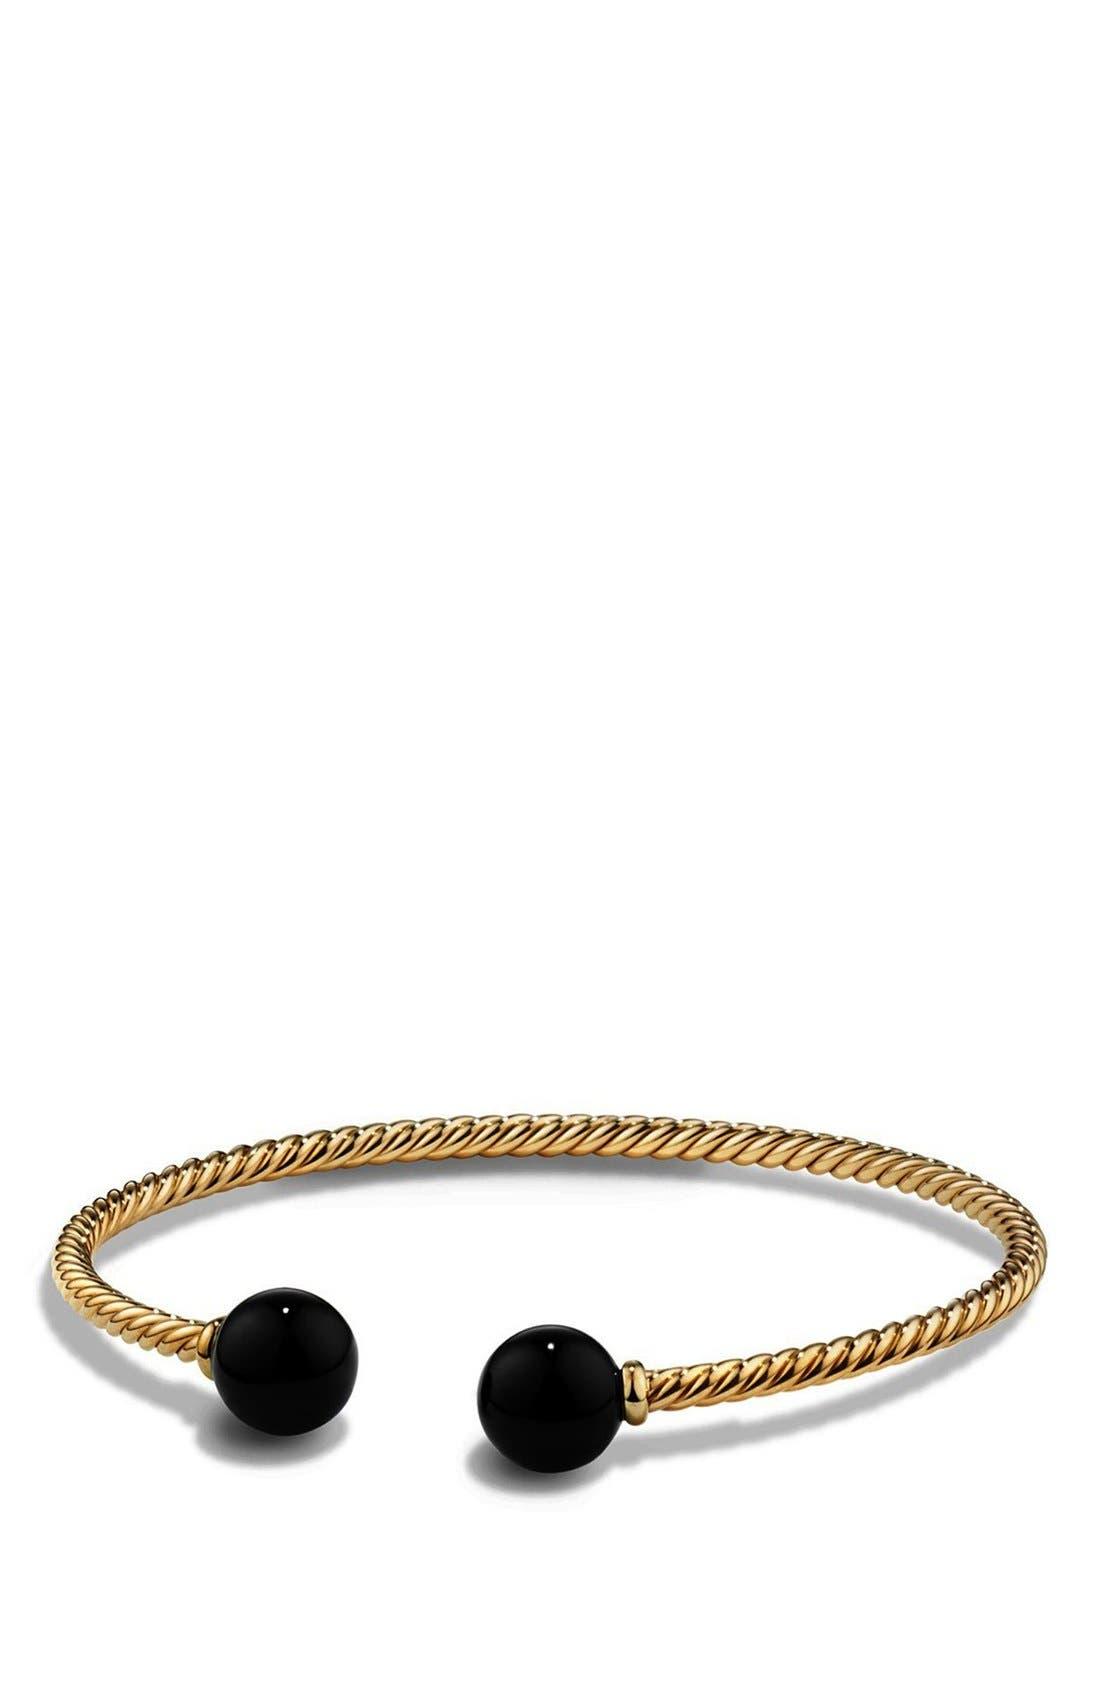 'Solari' Bead Bracelet,                         Main,                         color, Black Onyx